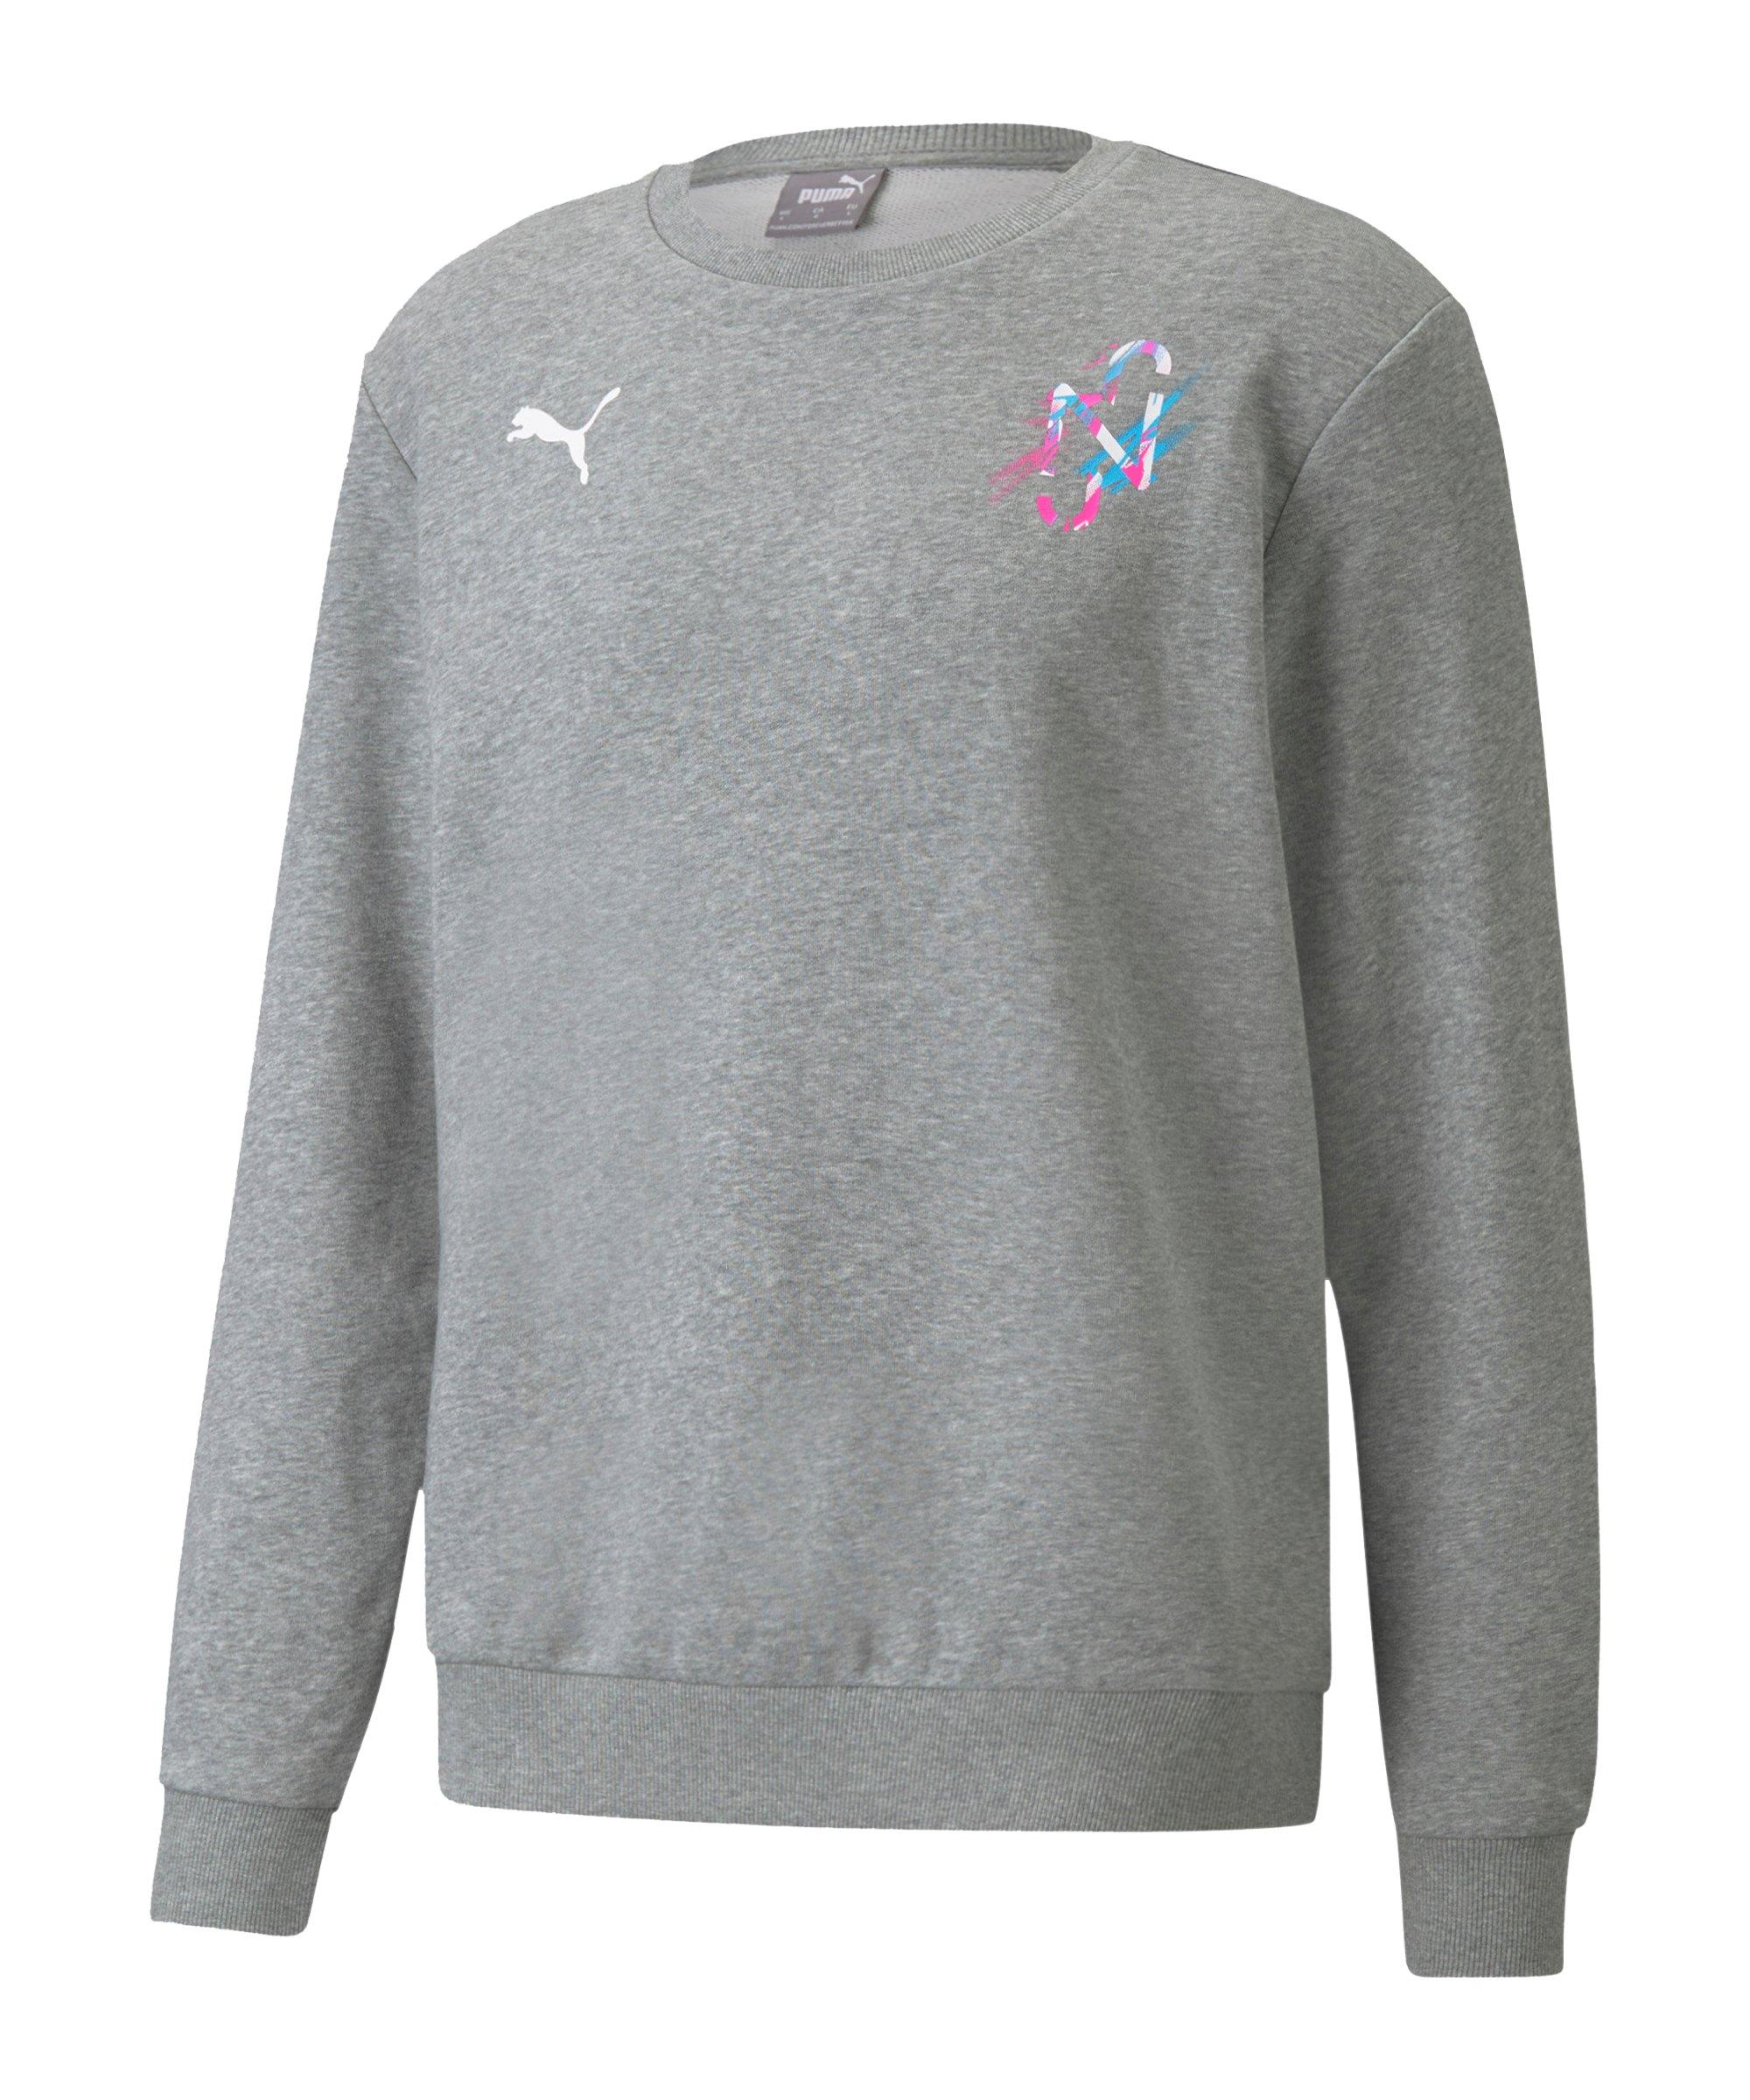 PUMA NJR CREATIVITY Sweatshirt Grau F06 - grau